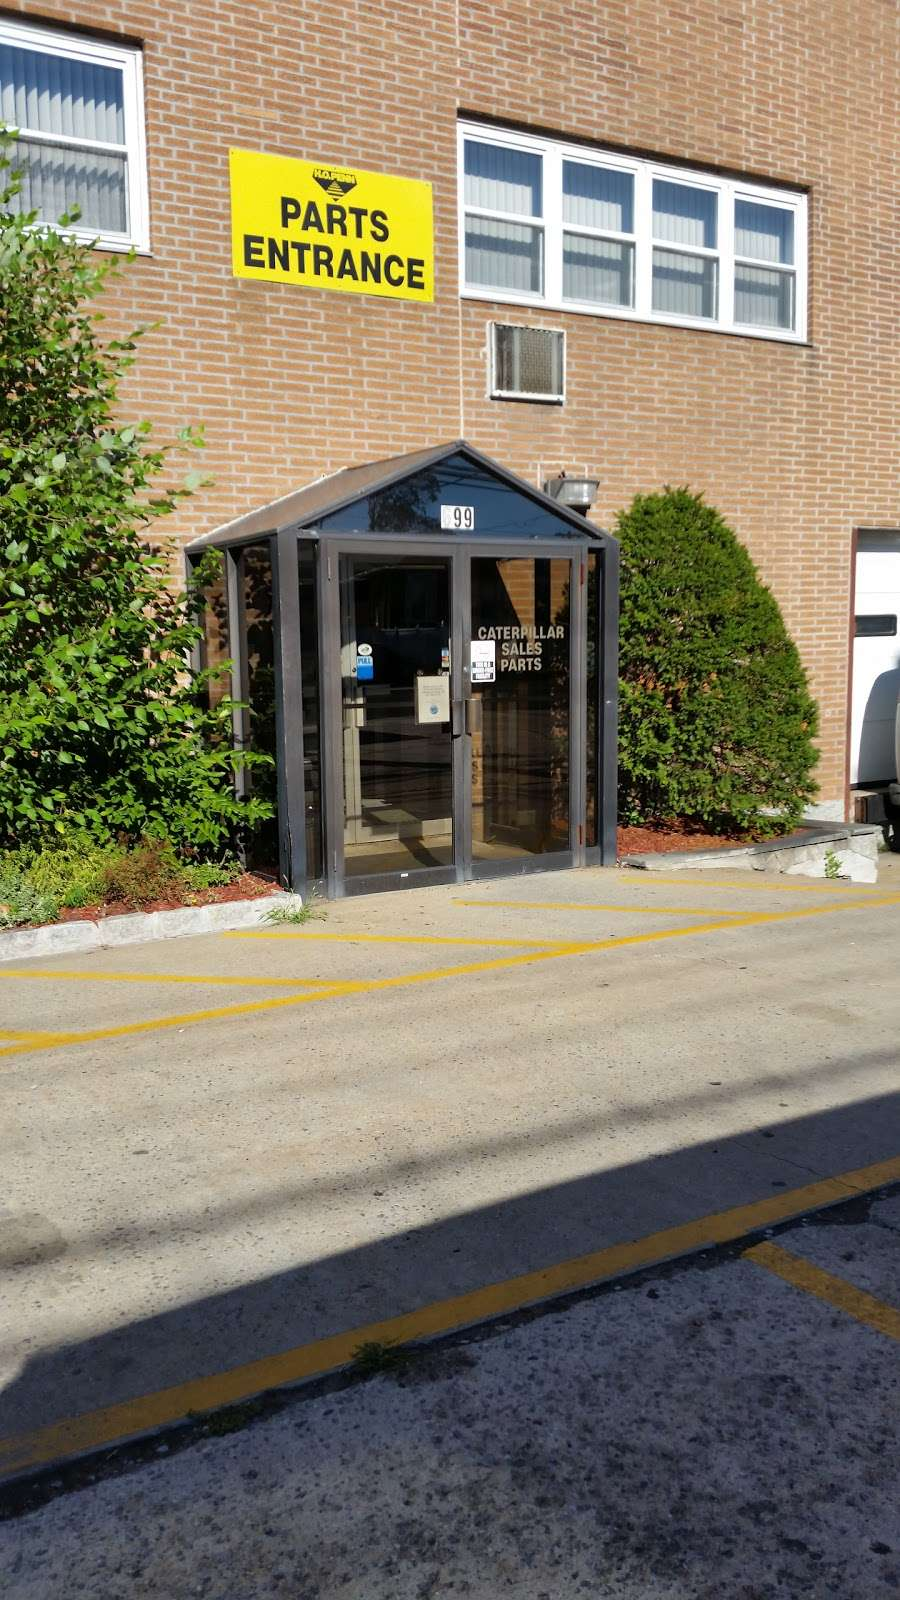 H.O. Penn Machinery Sales & Rentals - Bronx, NY - store  | Photo 2 of 6 | Address: 699 Brush Ave, Bronx, NY 10465, USA | Phone: (718) 863-3800